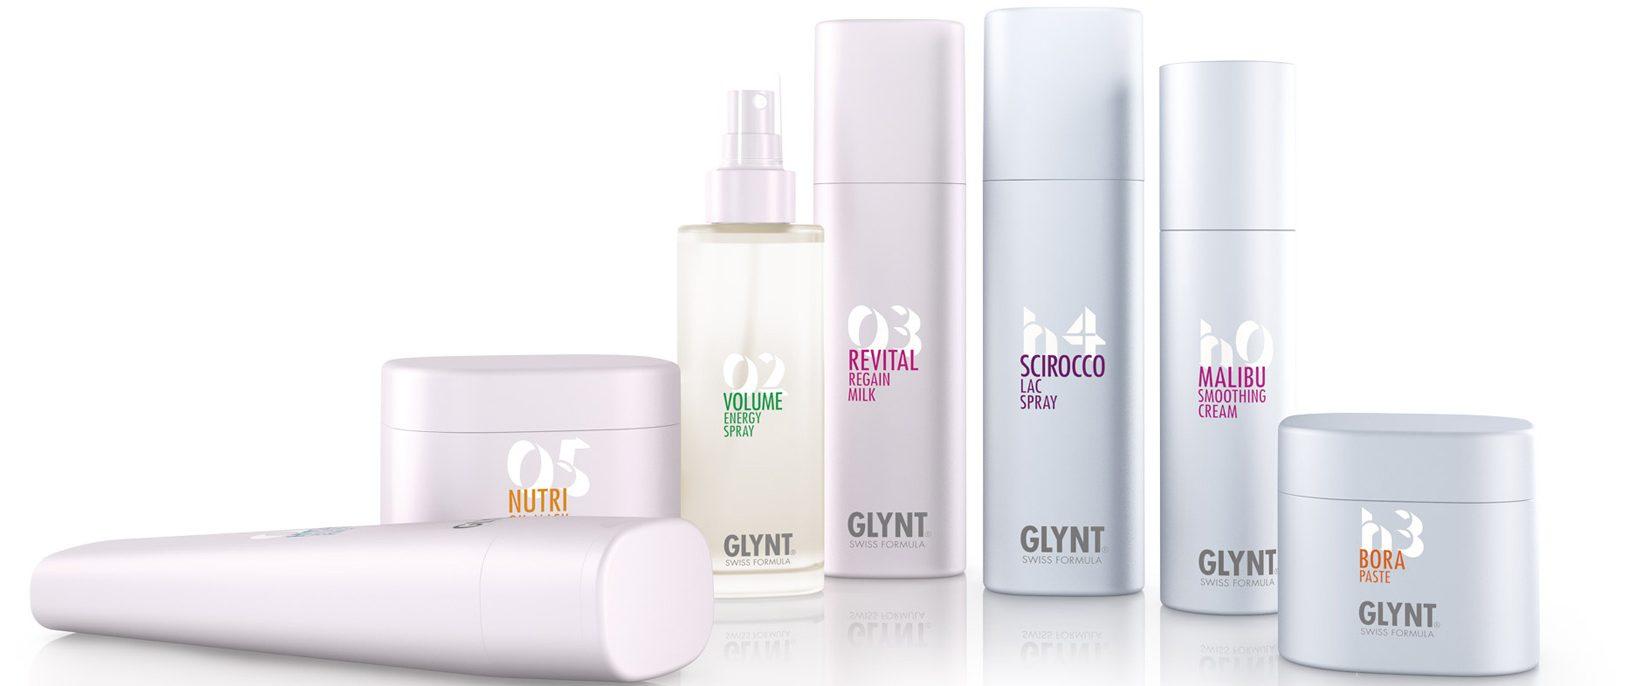 Haarflege & Kosmetik